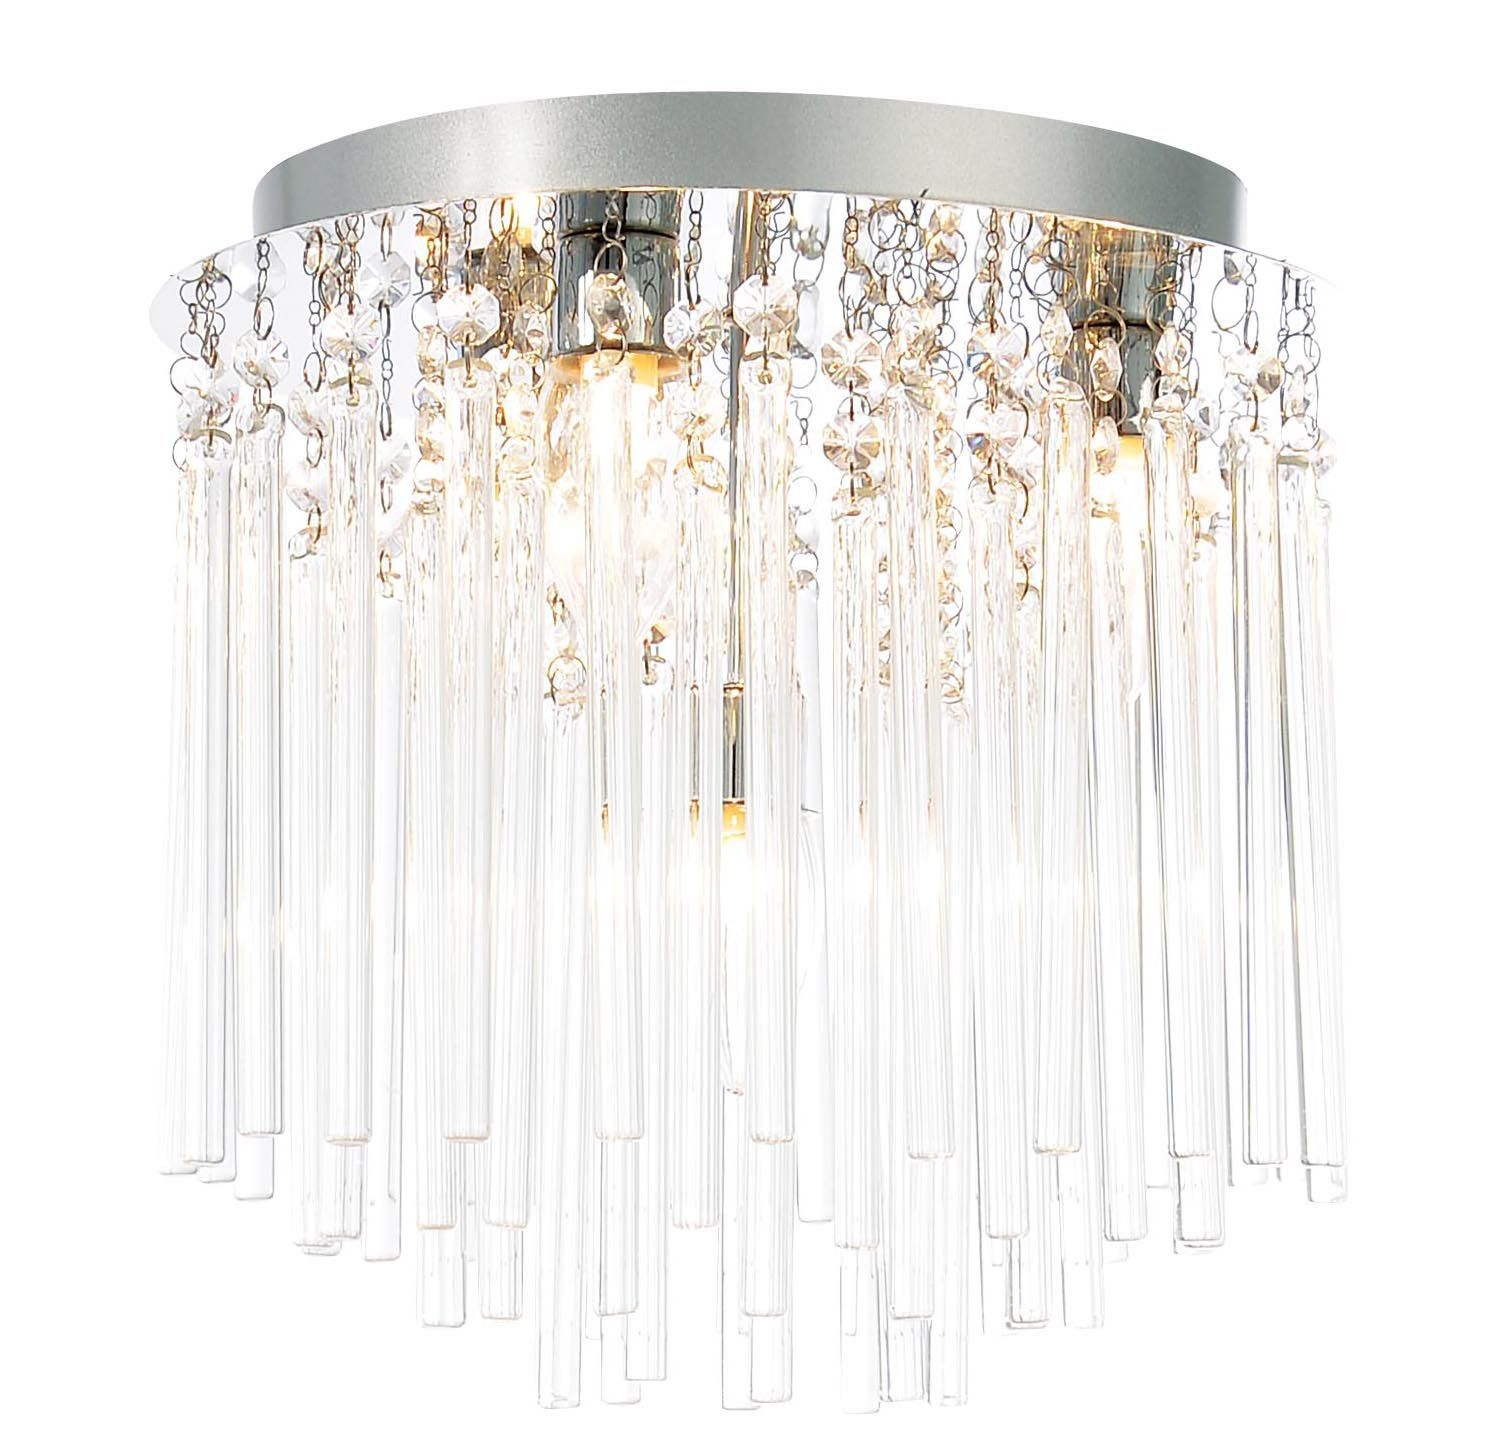 Bathroom Ceiling Lights At B&Q tooma chrome effect 4 lamp bathroom ceiling light | departments